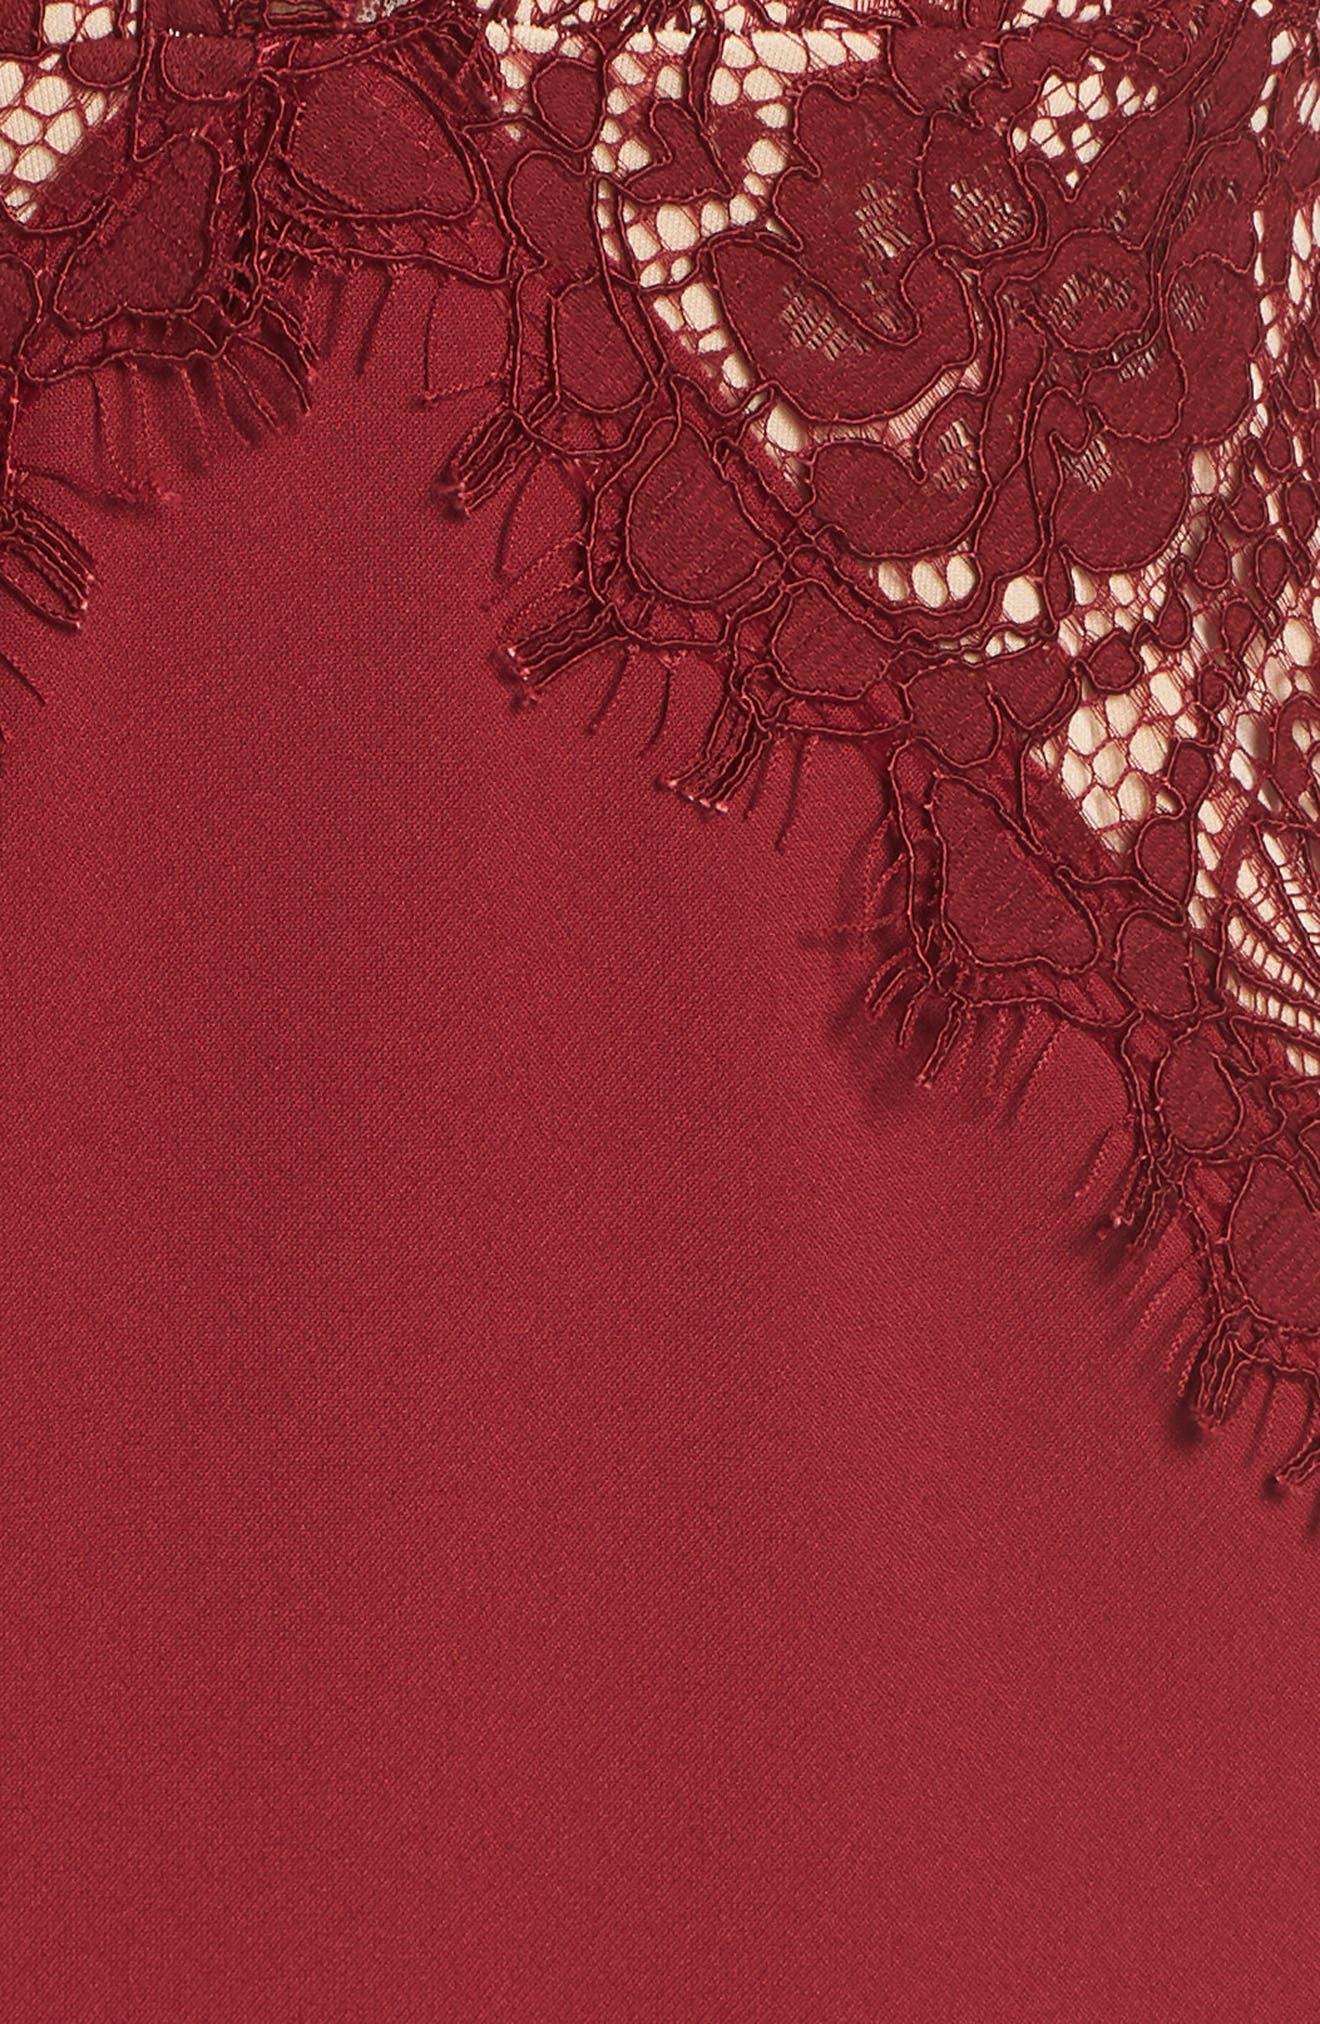 Amare Trumpet Evening Dress,                             Alternate thumbnail 6, color,                             BURGUNDY/ NUDE